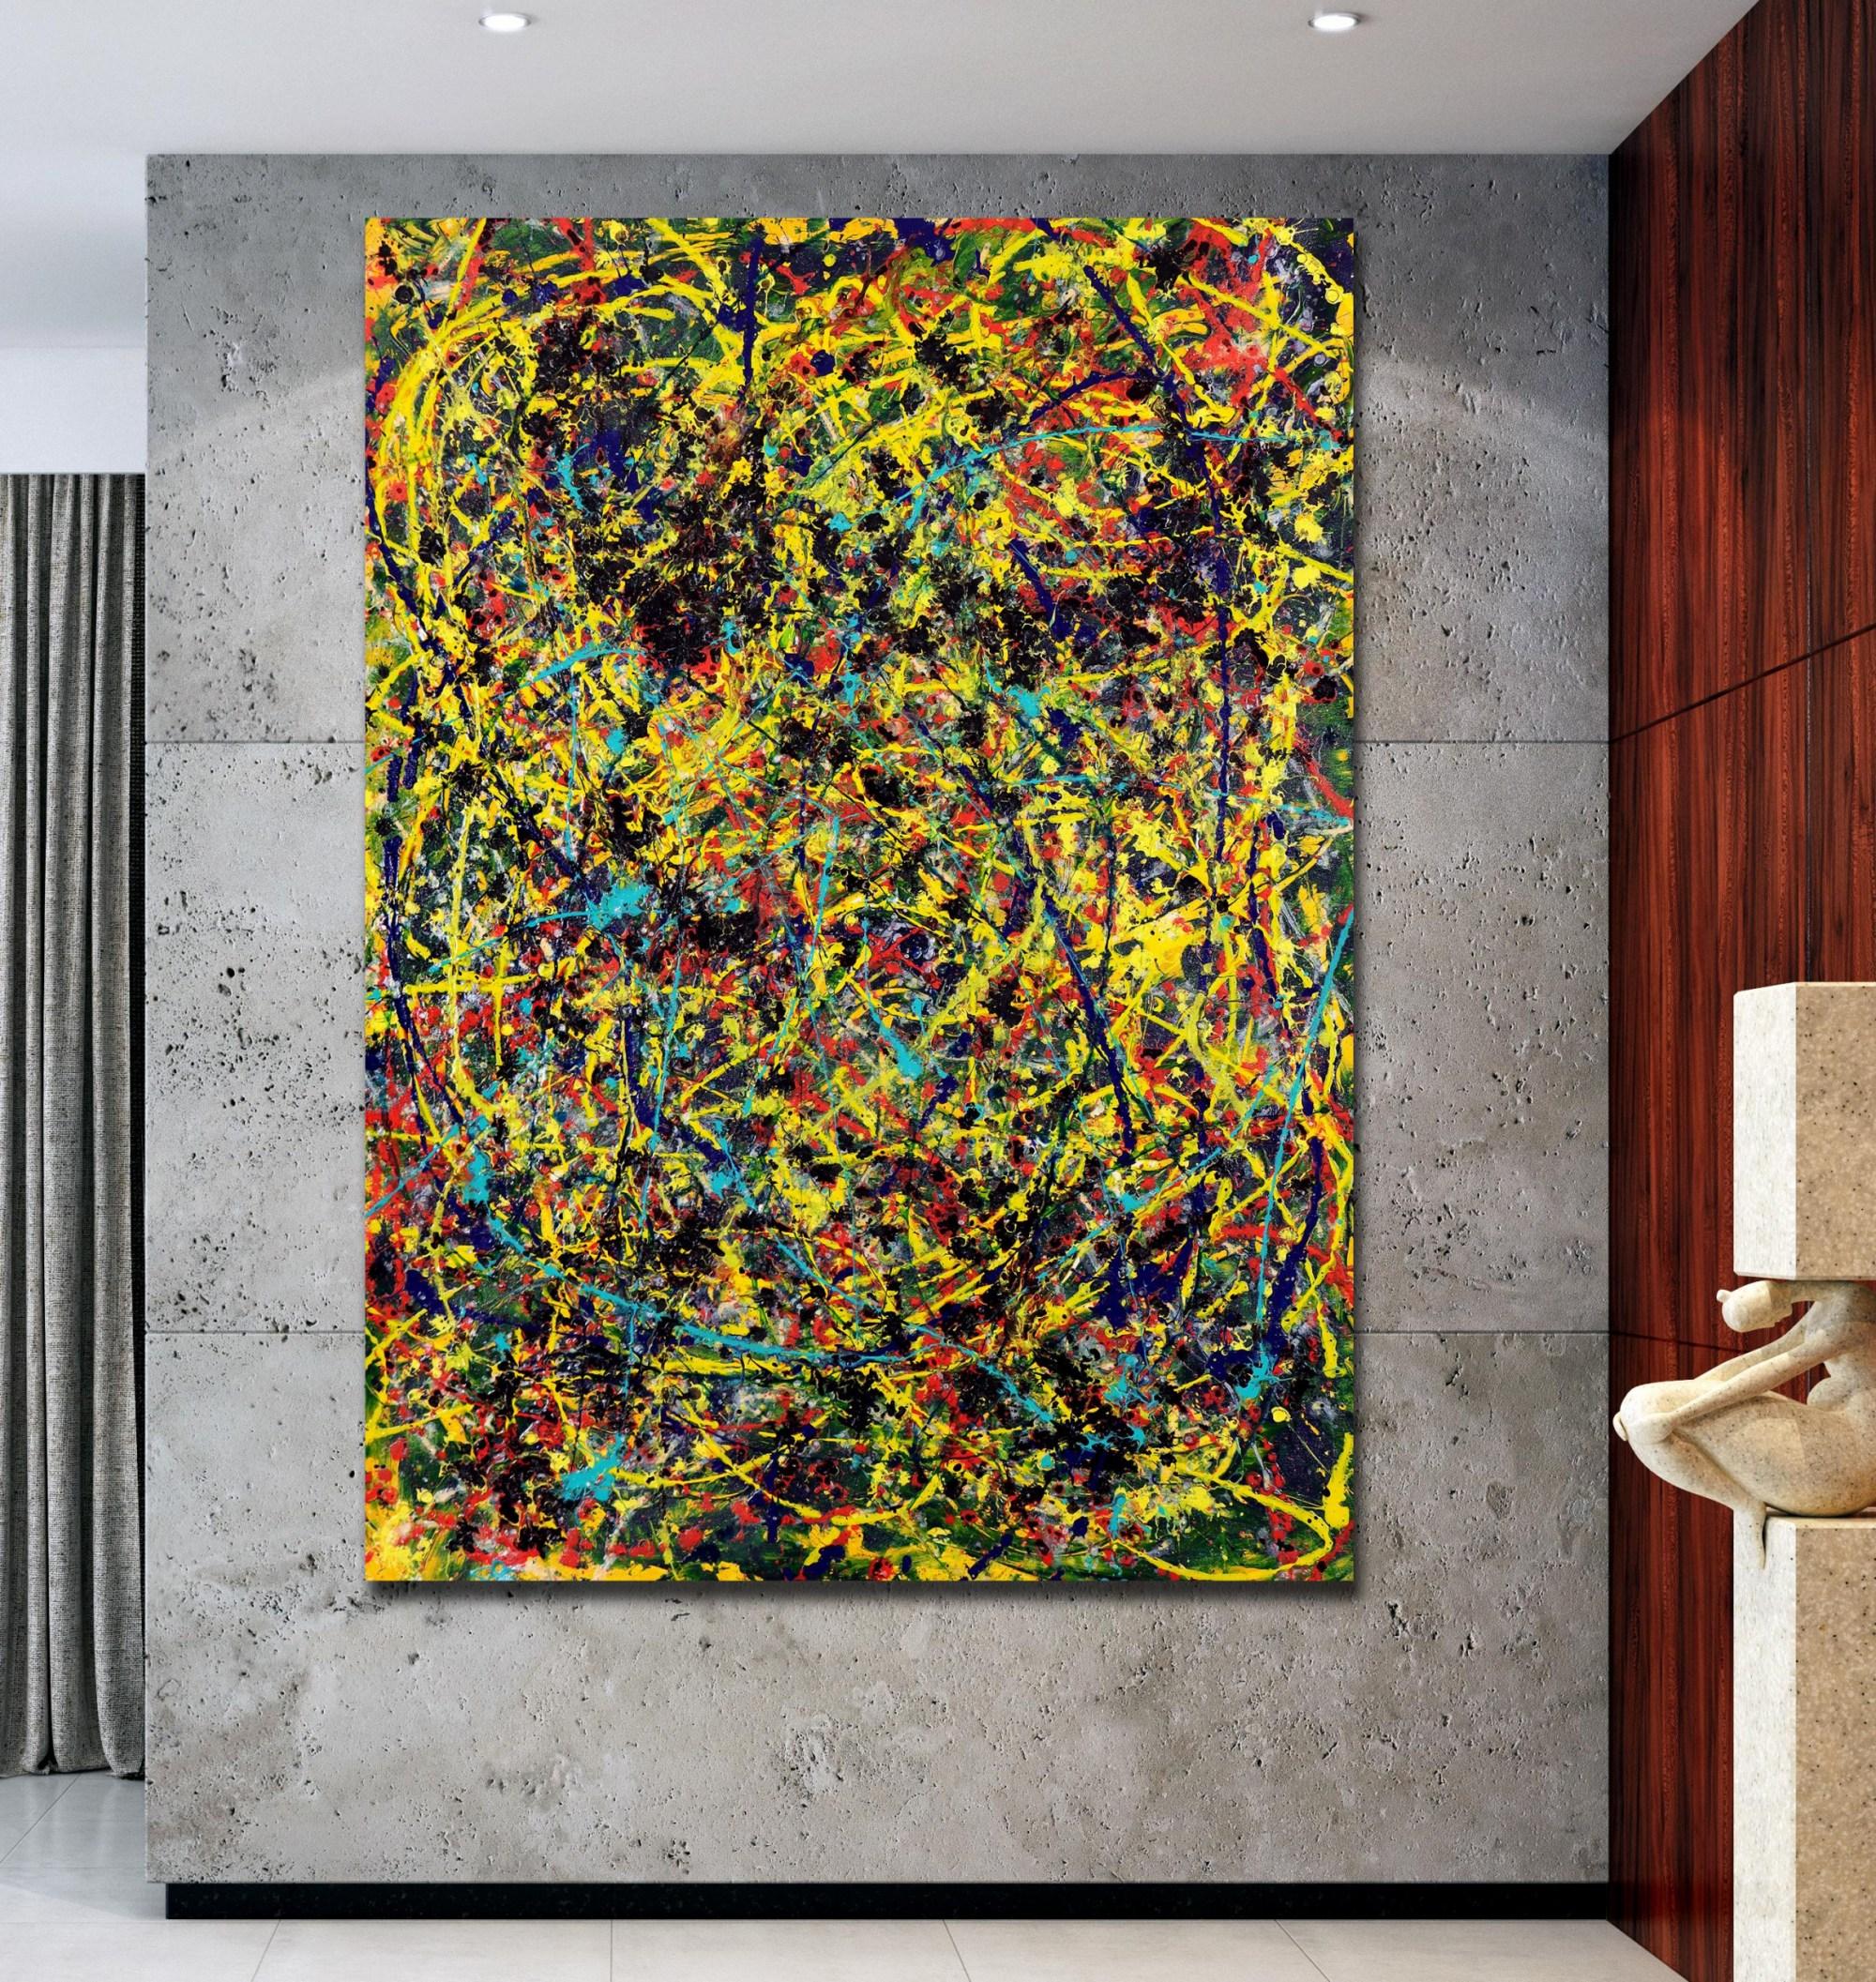 In Constant Motion (City life) 3 (2021) / Artist: Nestor Toro